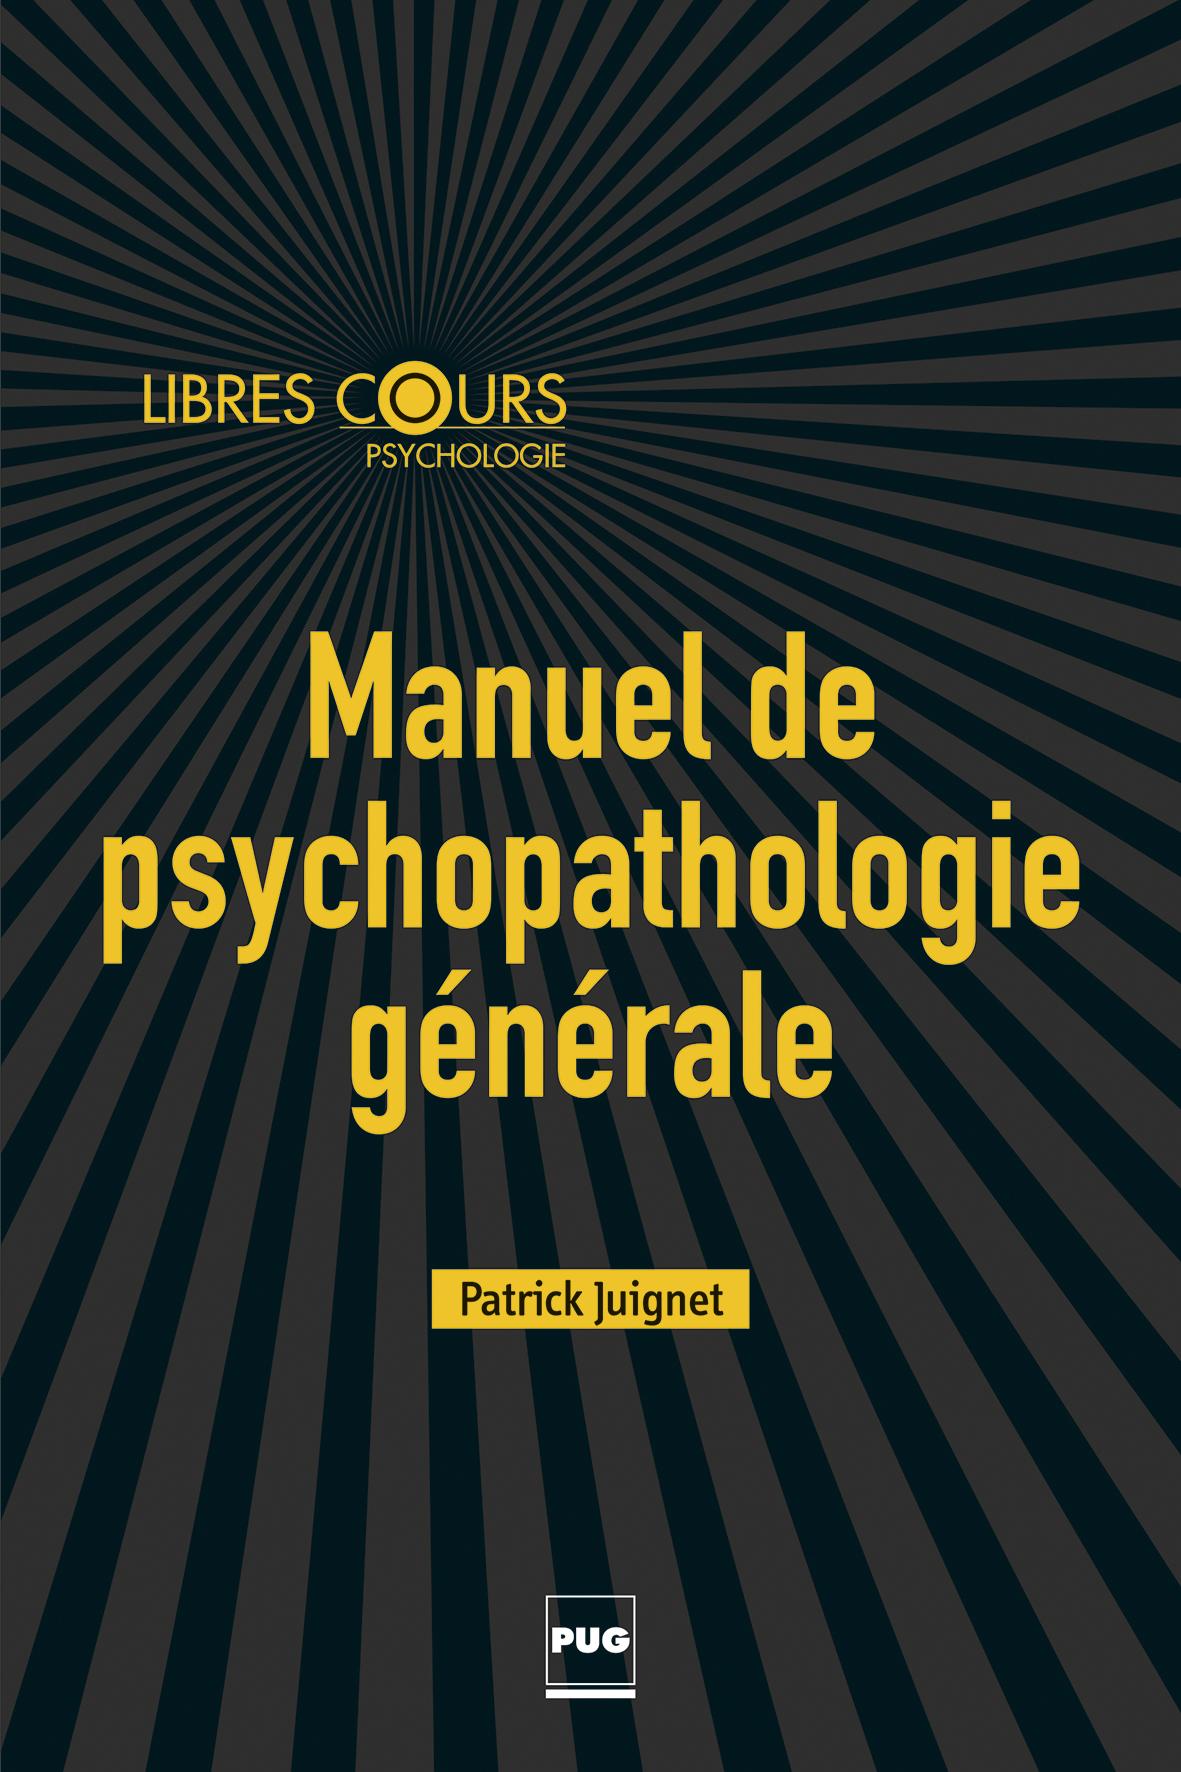 manuel de psychopathologie g u00e9n u00e9rale -  enfant